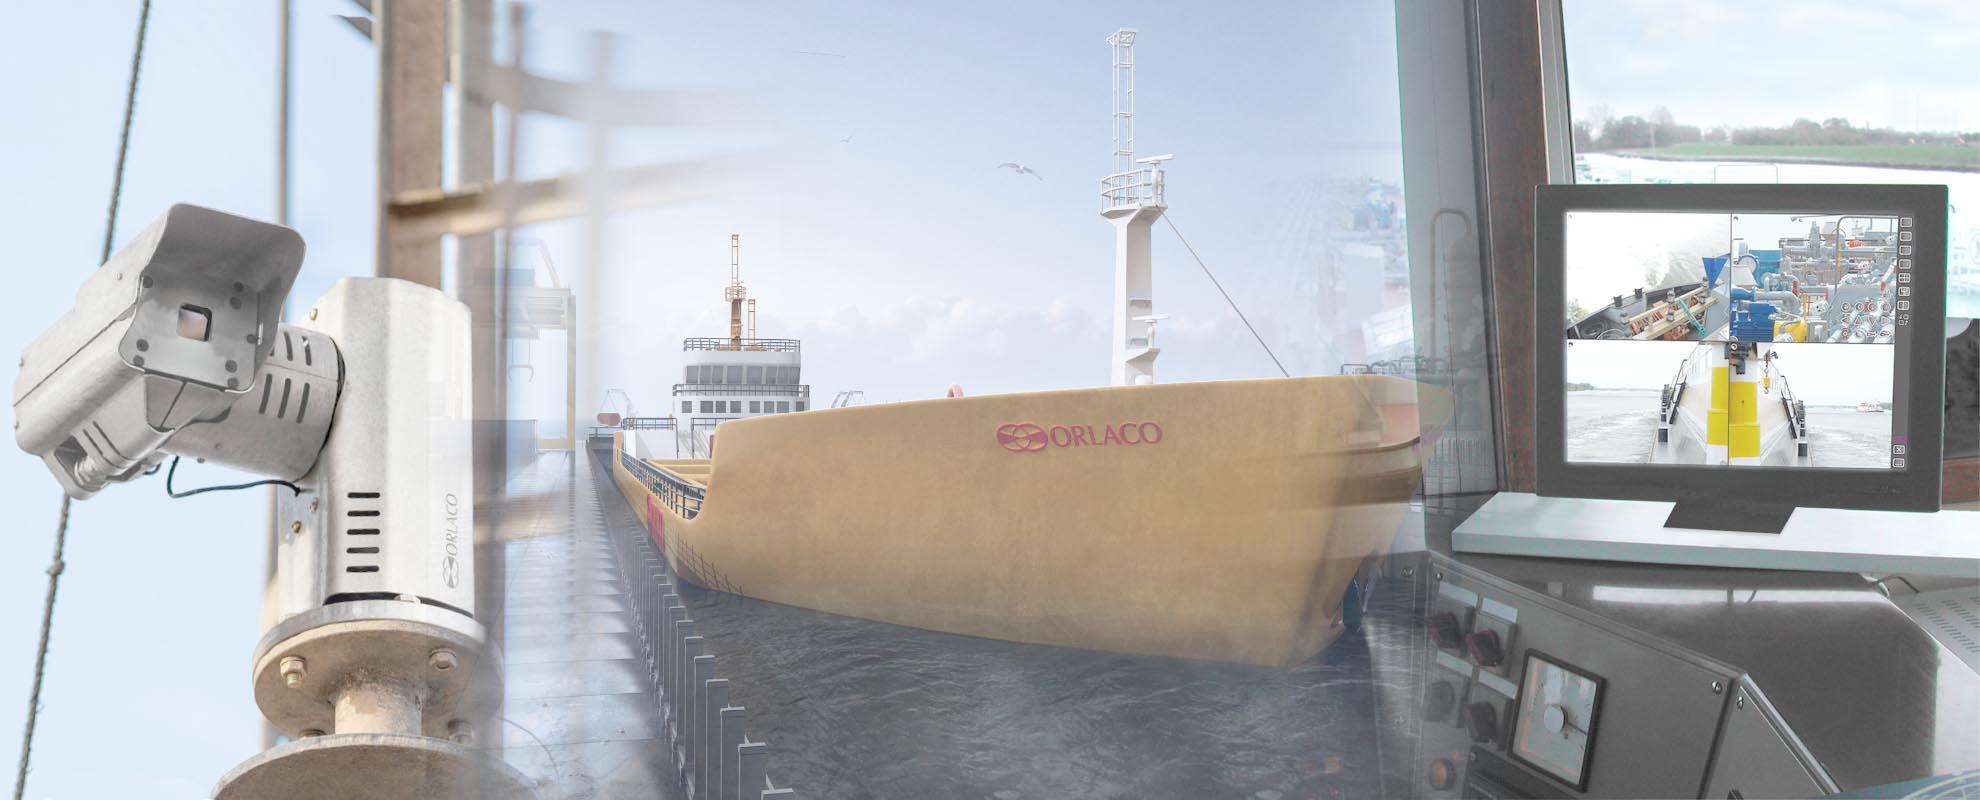 camera marine offshore orlaco surveilance navires video ip thermique gestion plusieurs postes allwan